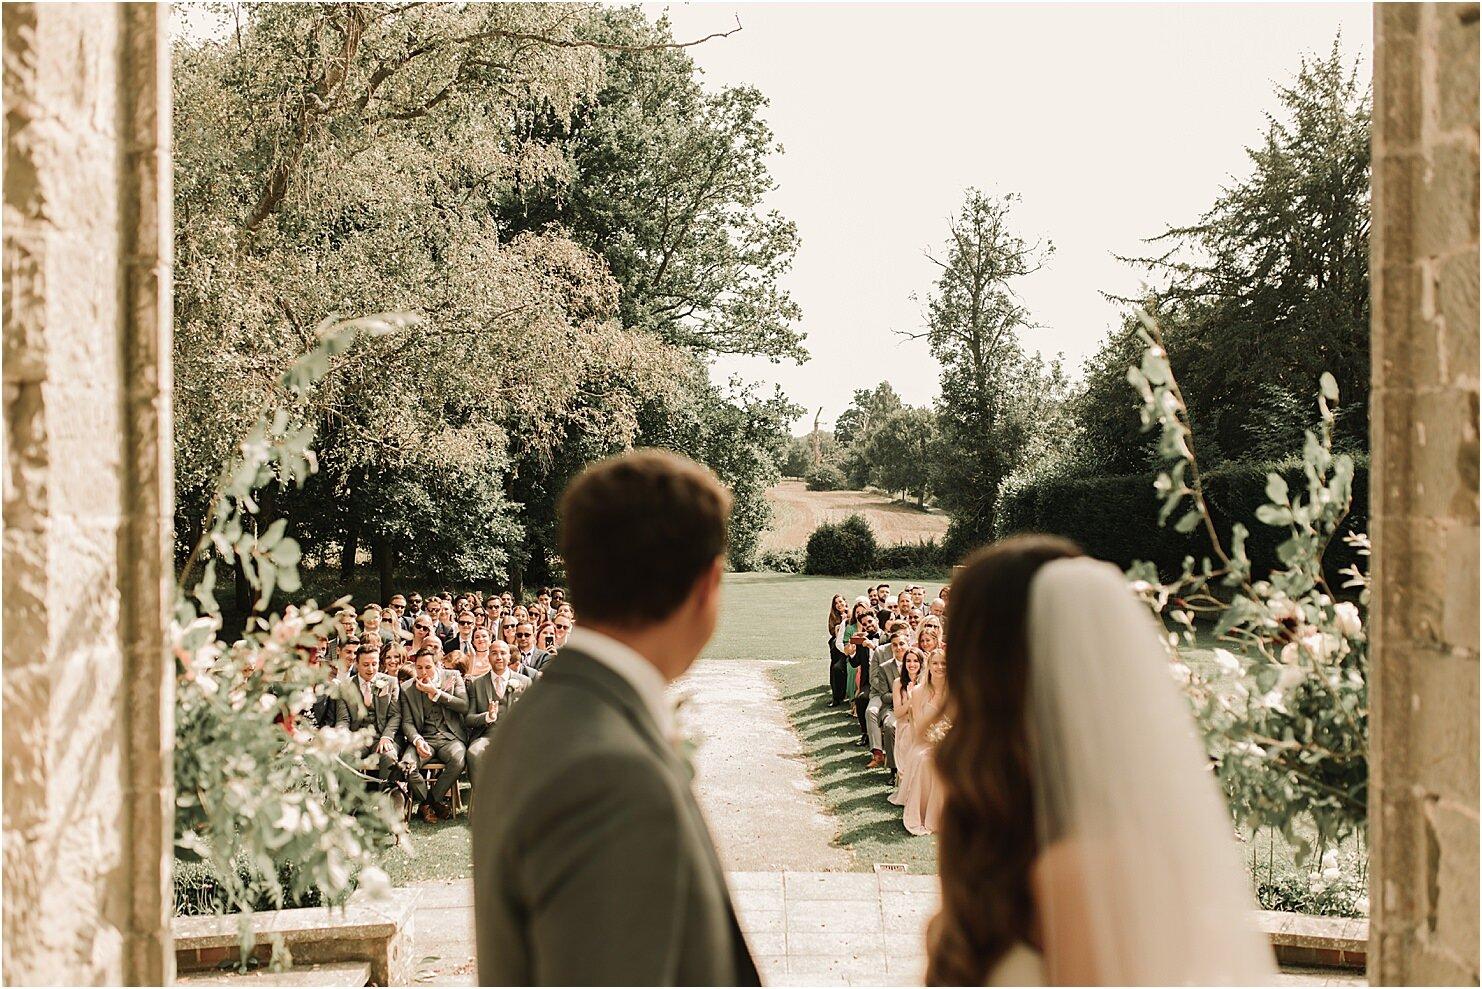 boda-de-cuento-en-castillo-boda-en-londres-55.jpg